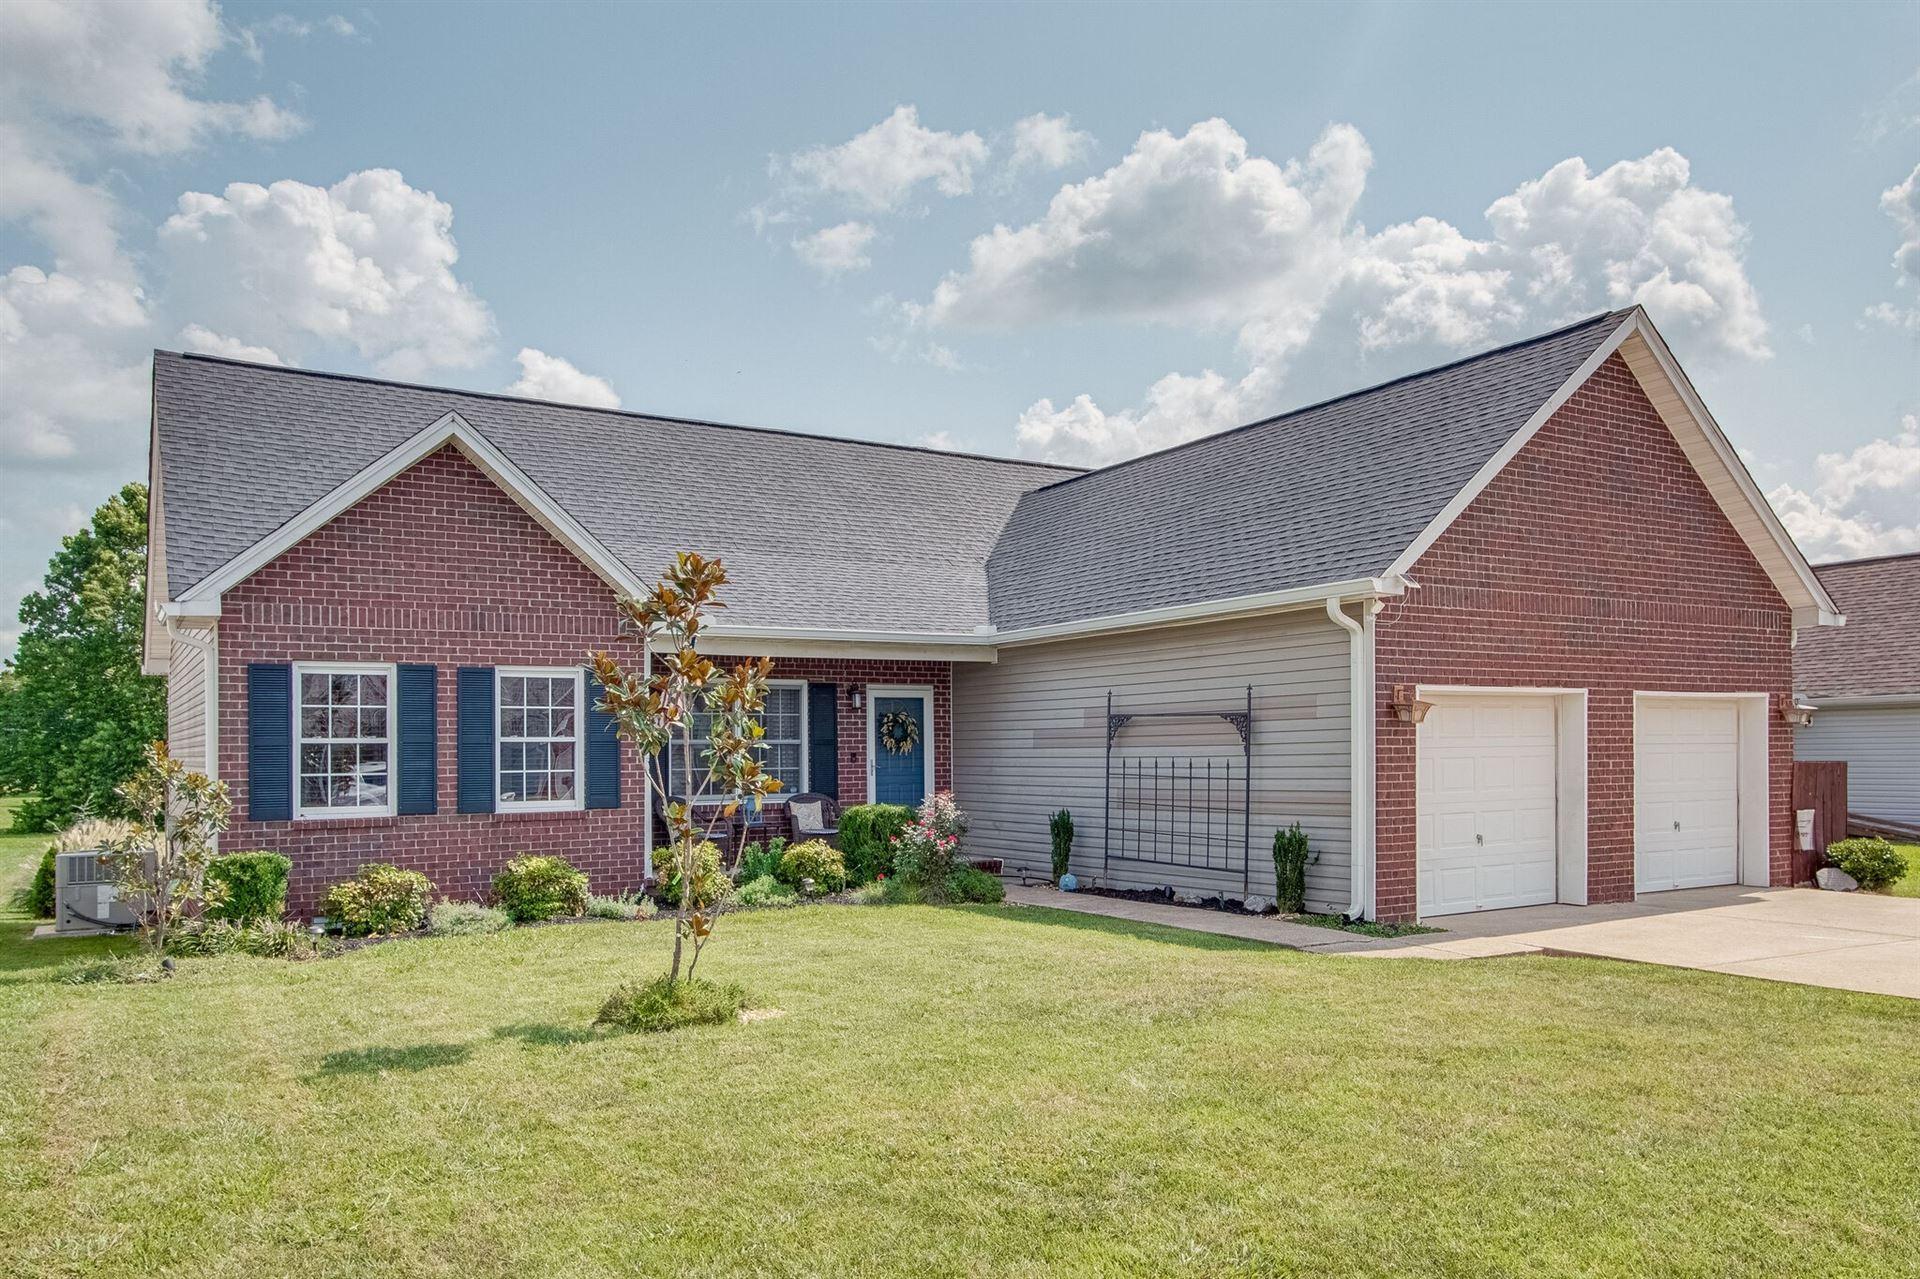 Photo of 1506 Chapman Ln, Spring Hill, TN 37174 (MLS # 2297972)